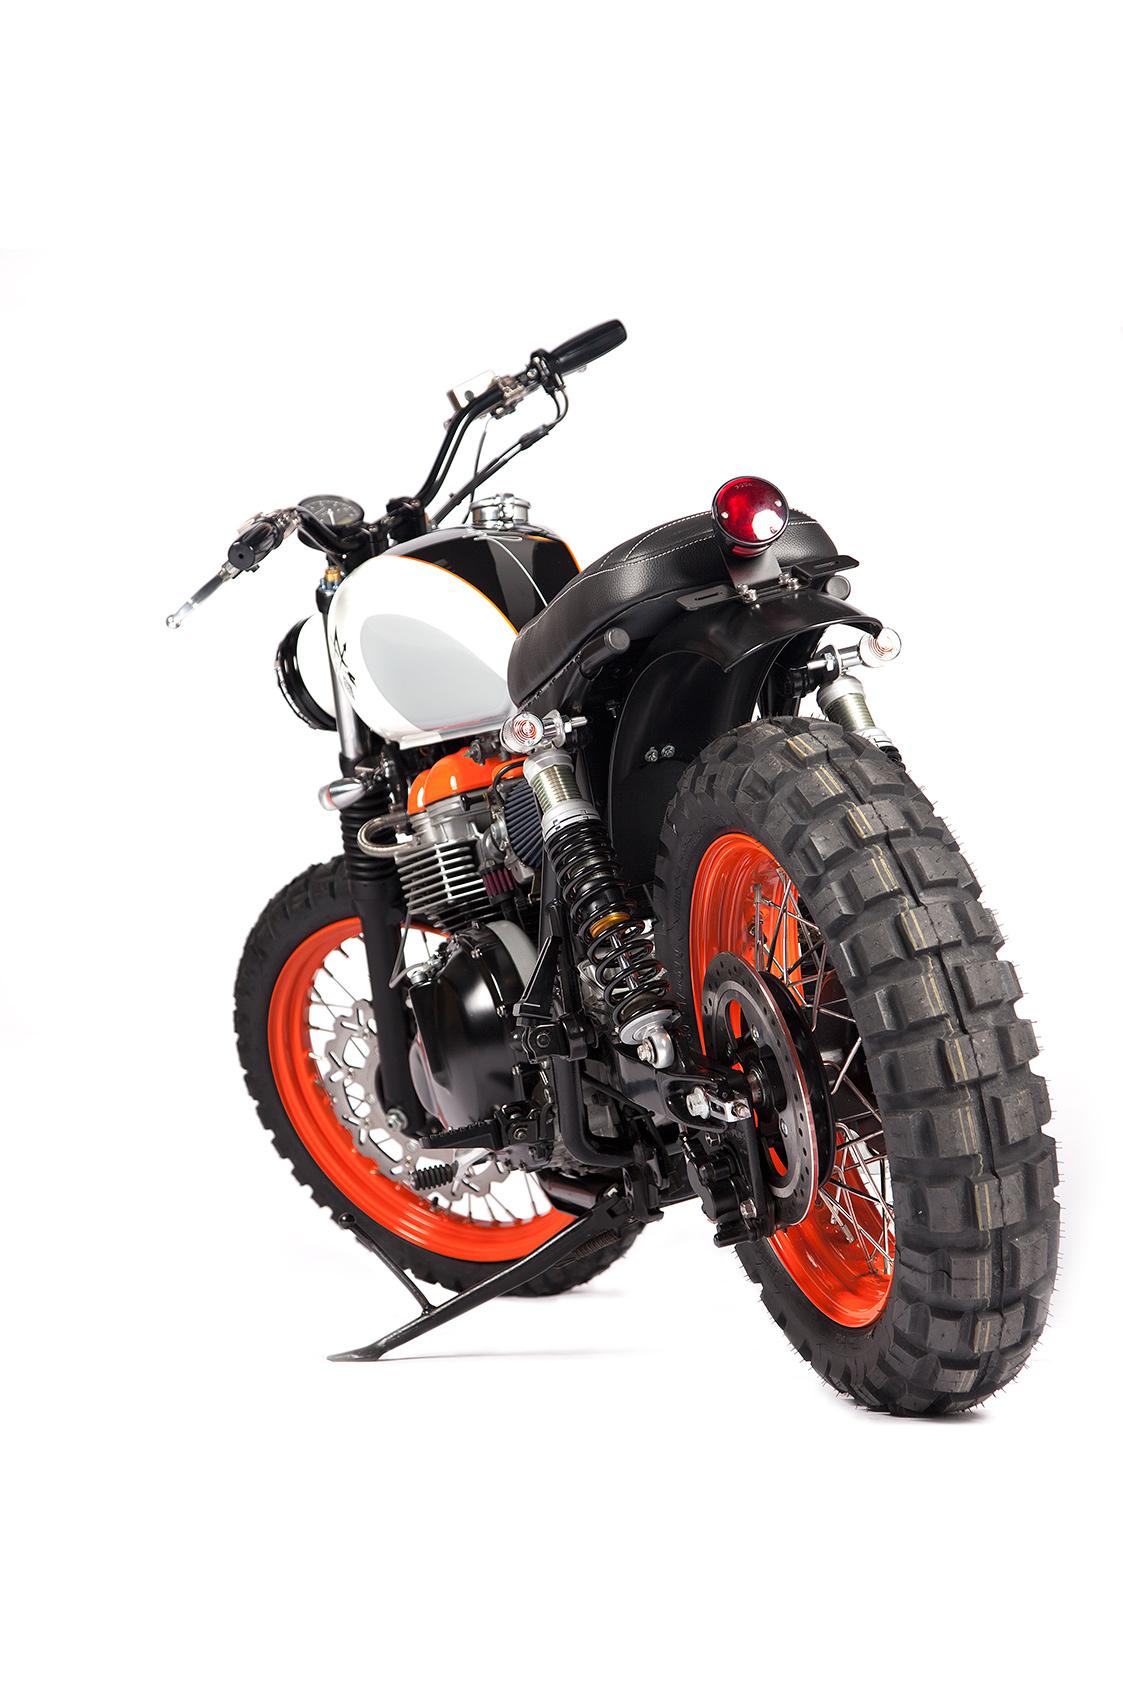 maria_motorcycles_triumph_bonneville_julijana_7656